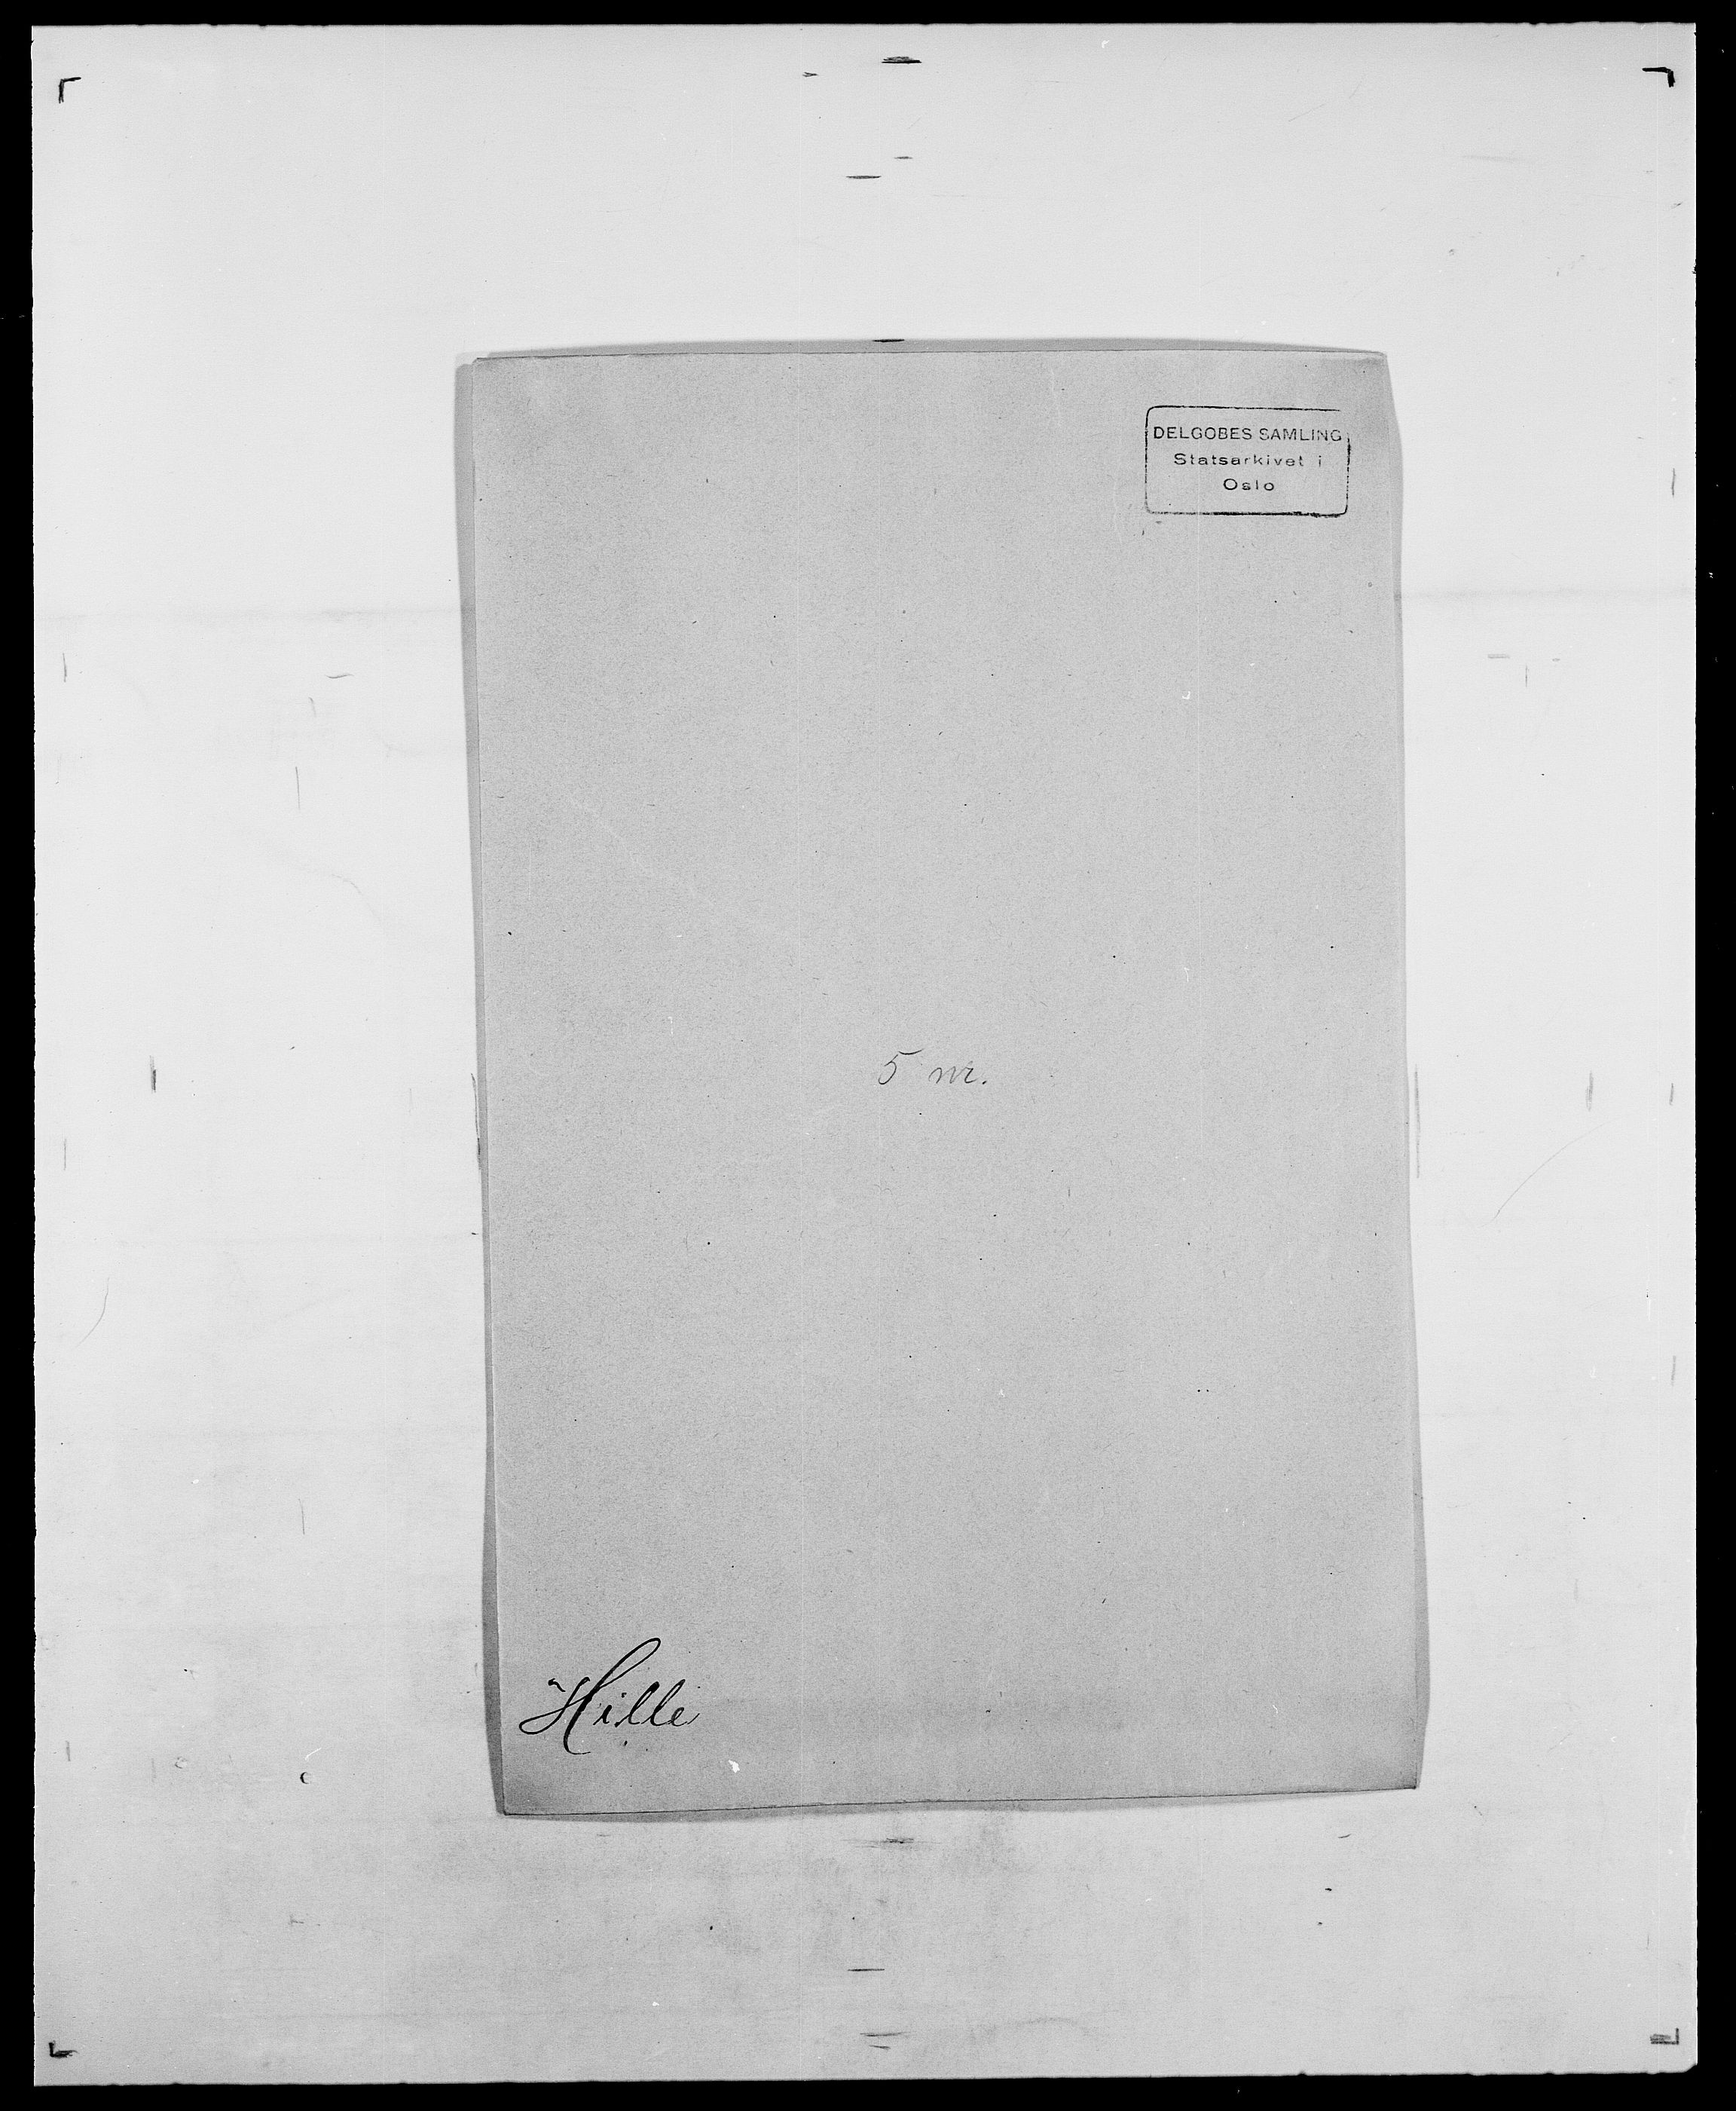 SAO, Delgobe, Charles Antoine - samling, D/Da/L0017: Helander - Hjørne, s. 426